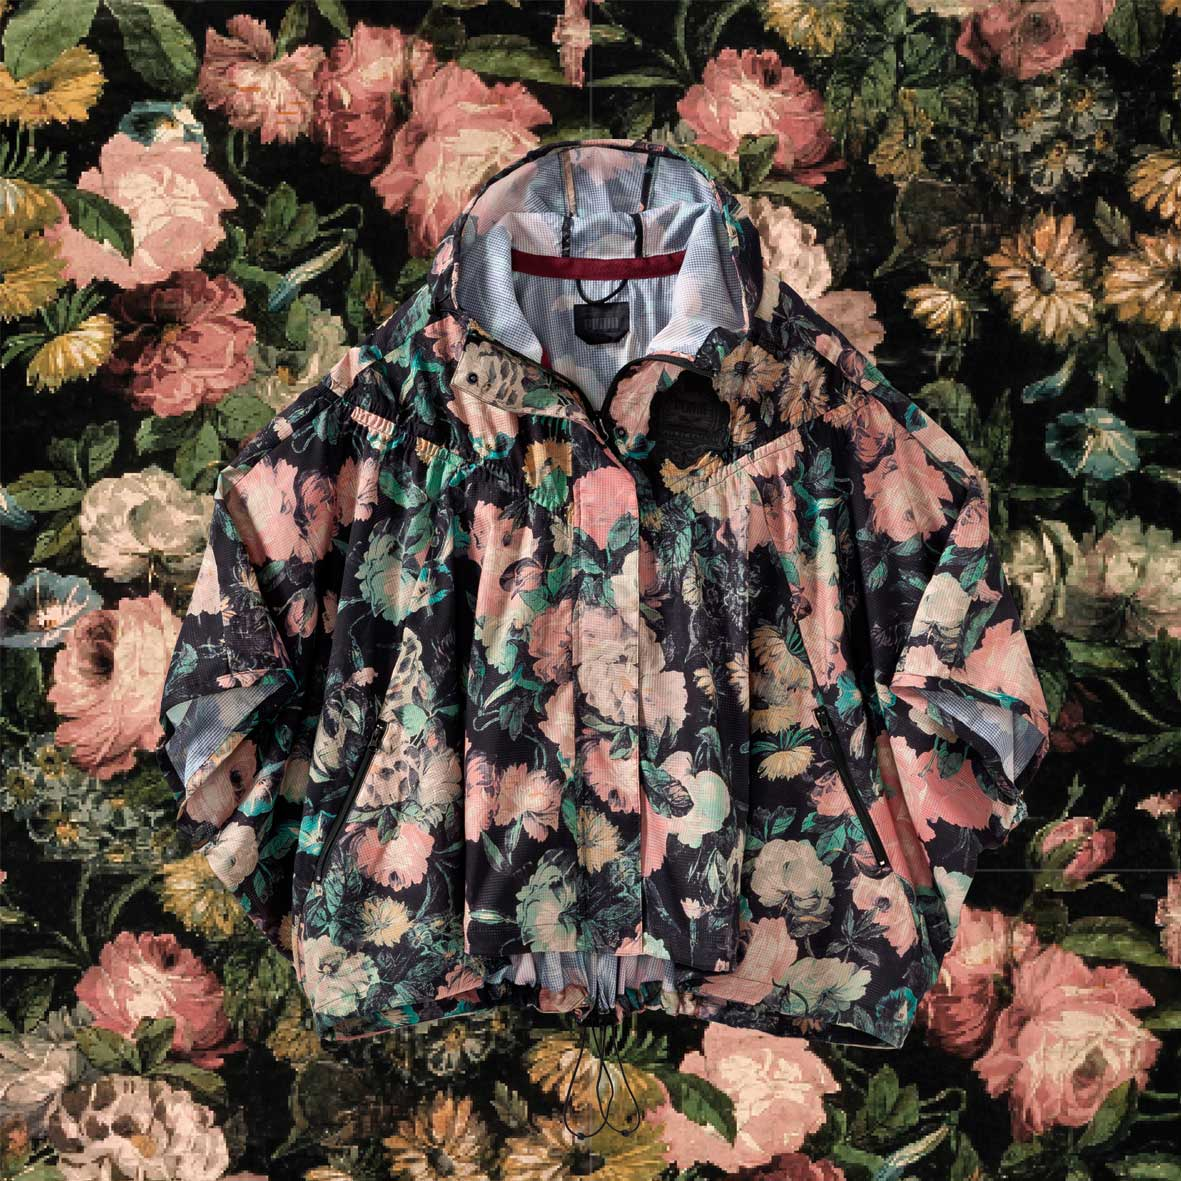 puma-x-hoh-jacket-image-2